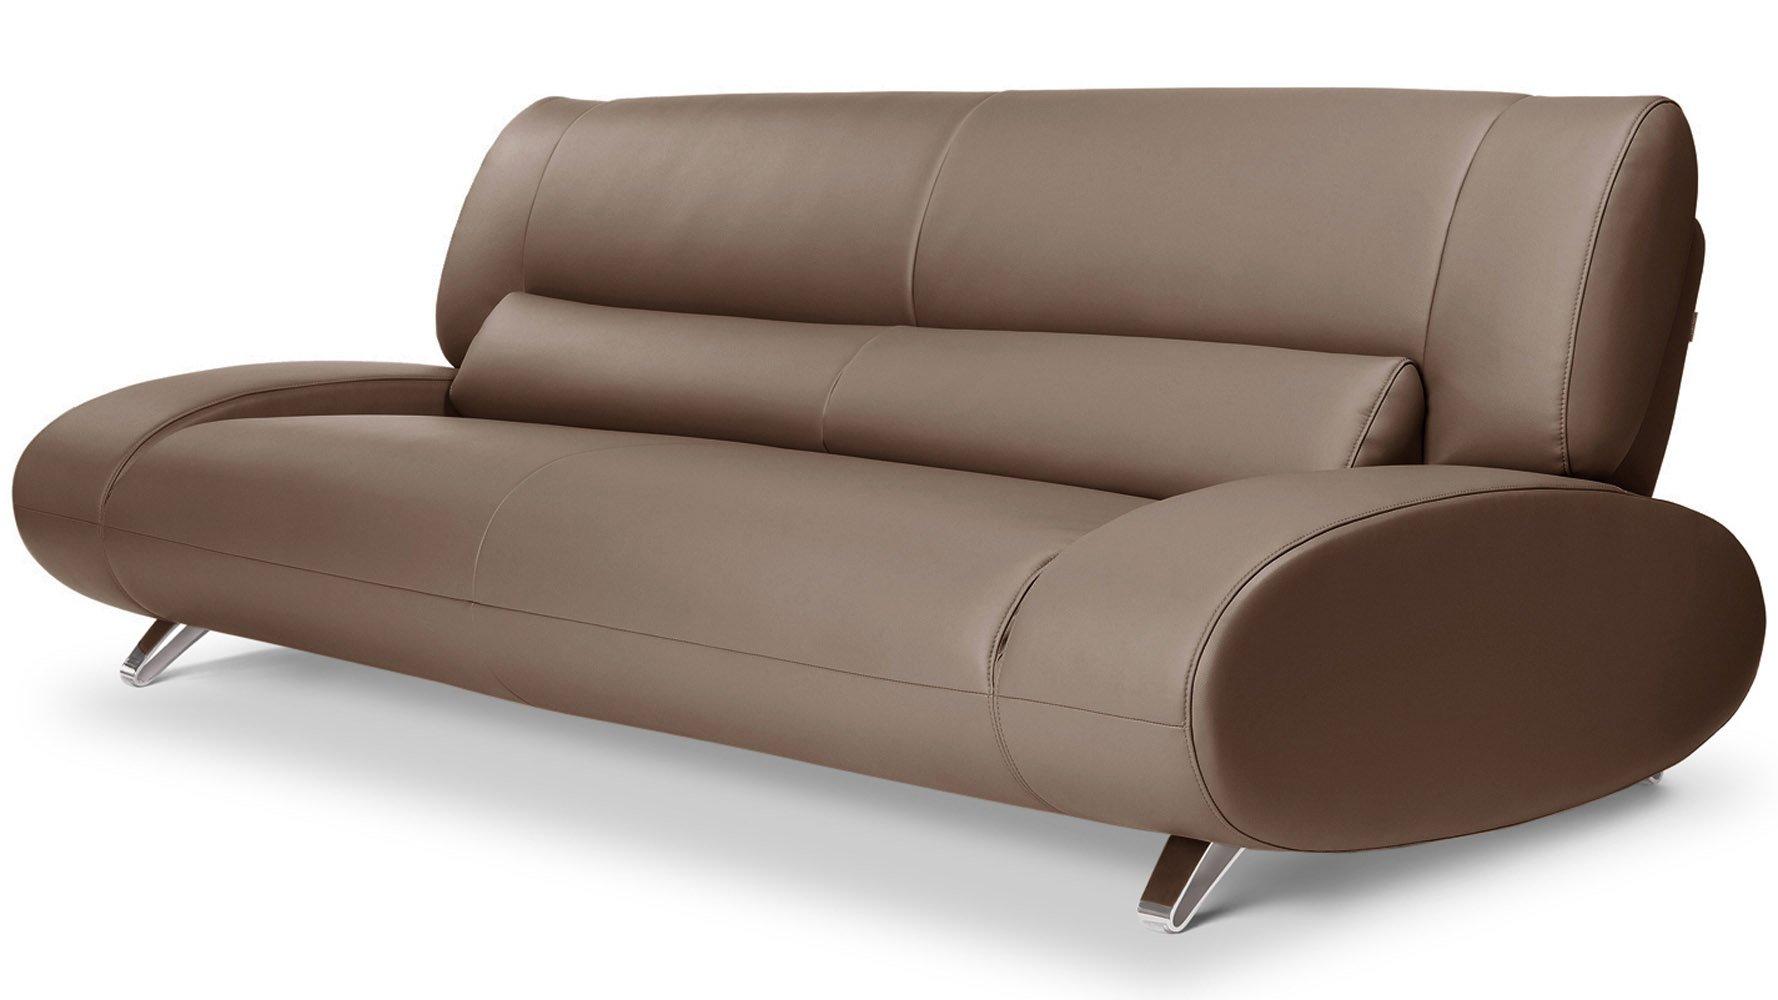 Aspen Leather Sofa Best 30 Of Aspen Leather Sofas Thesofa